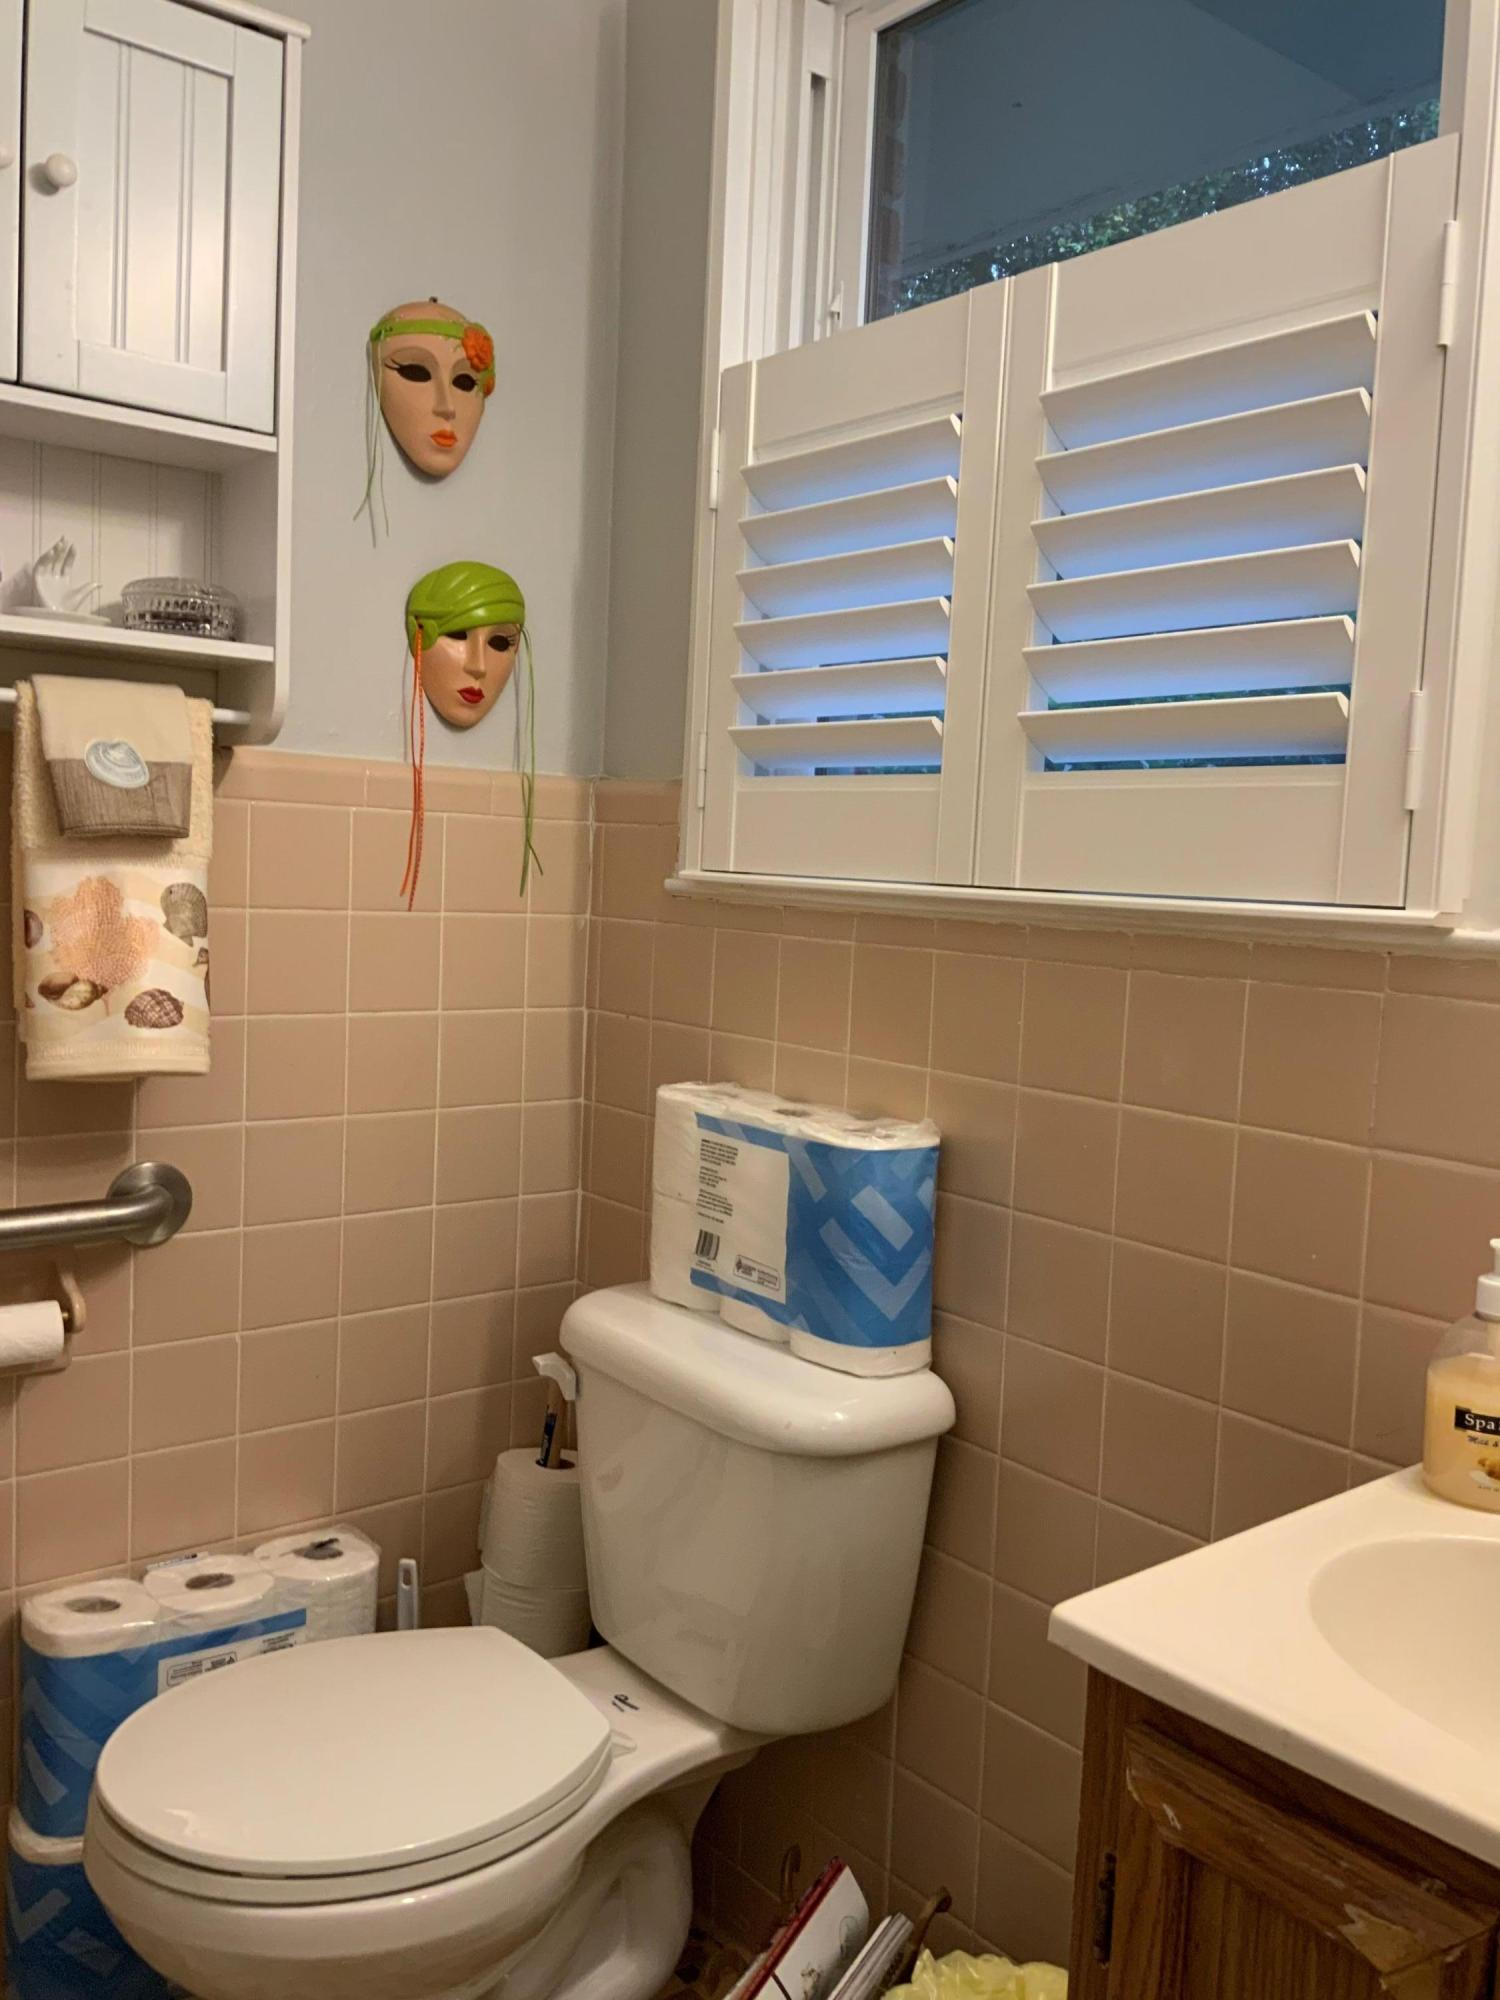 Northbridge Terrace Homes For Sale - 1156 Northbridge, Charleston, SC - 18